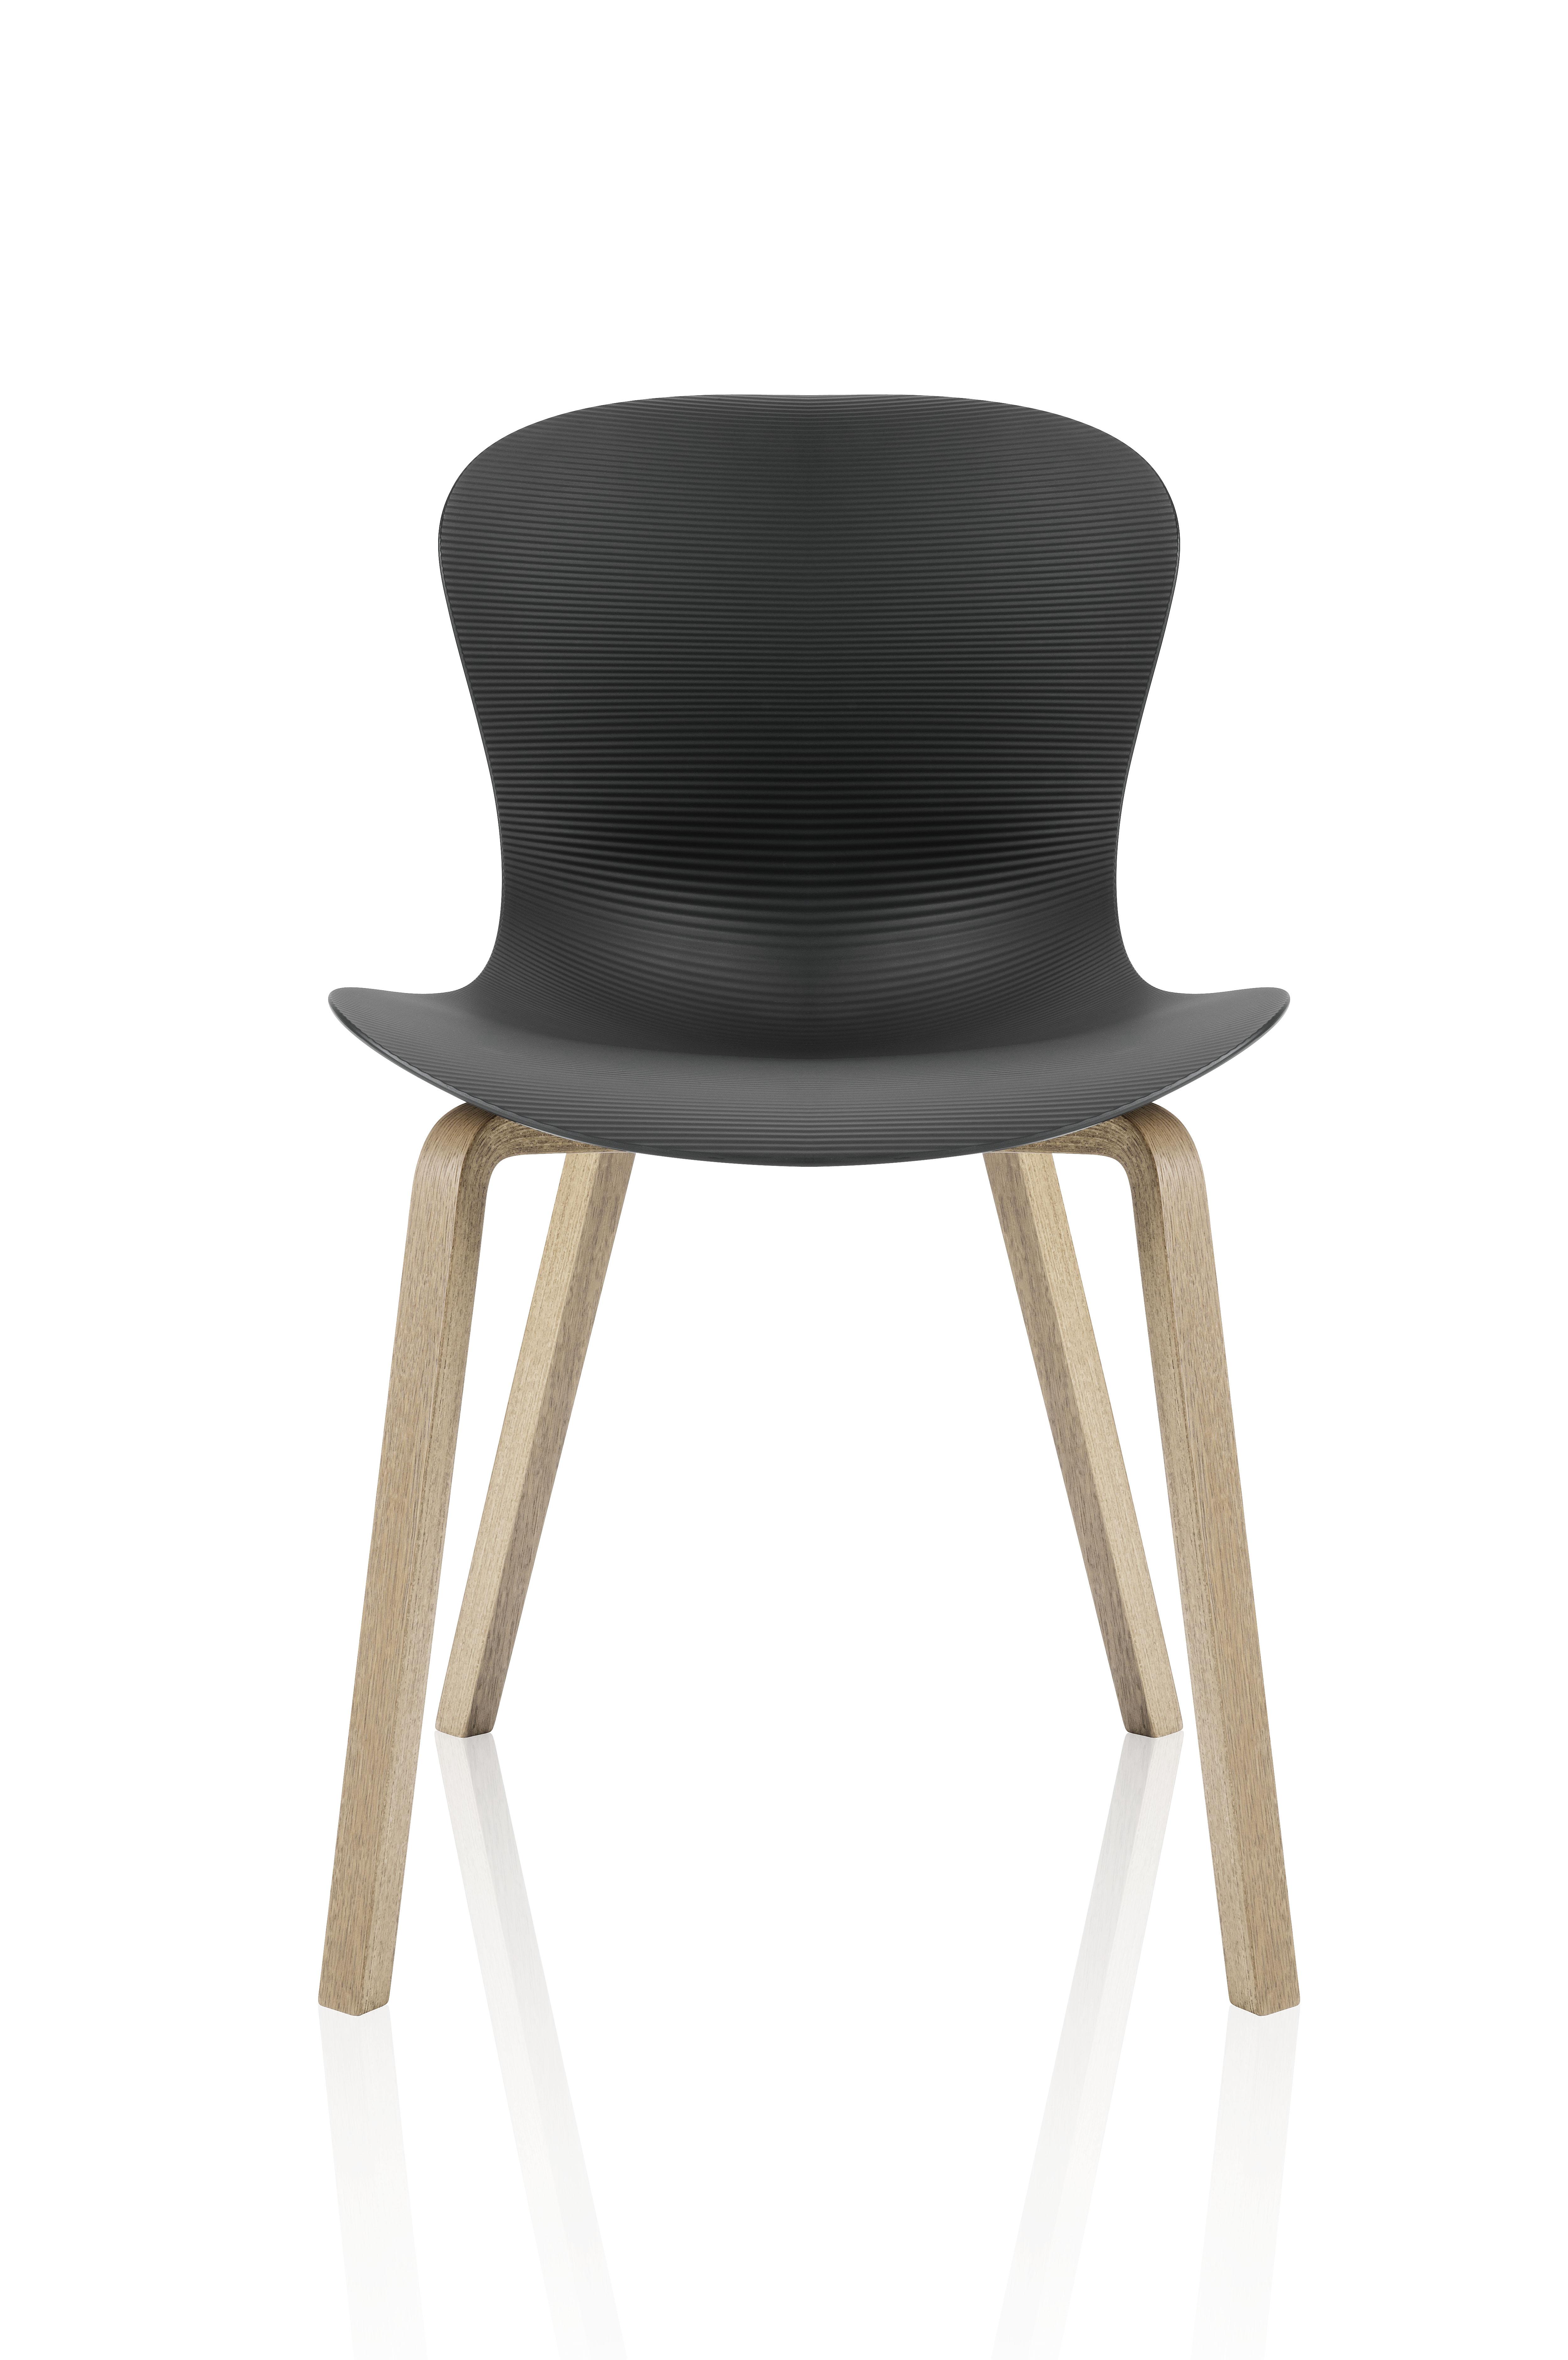 nap chair kasper salto fritz hansen suite ny. Black Bedroom Furniture Sets. Home Design Ideas